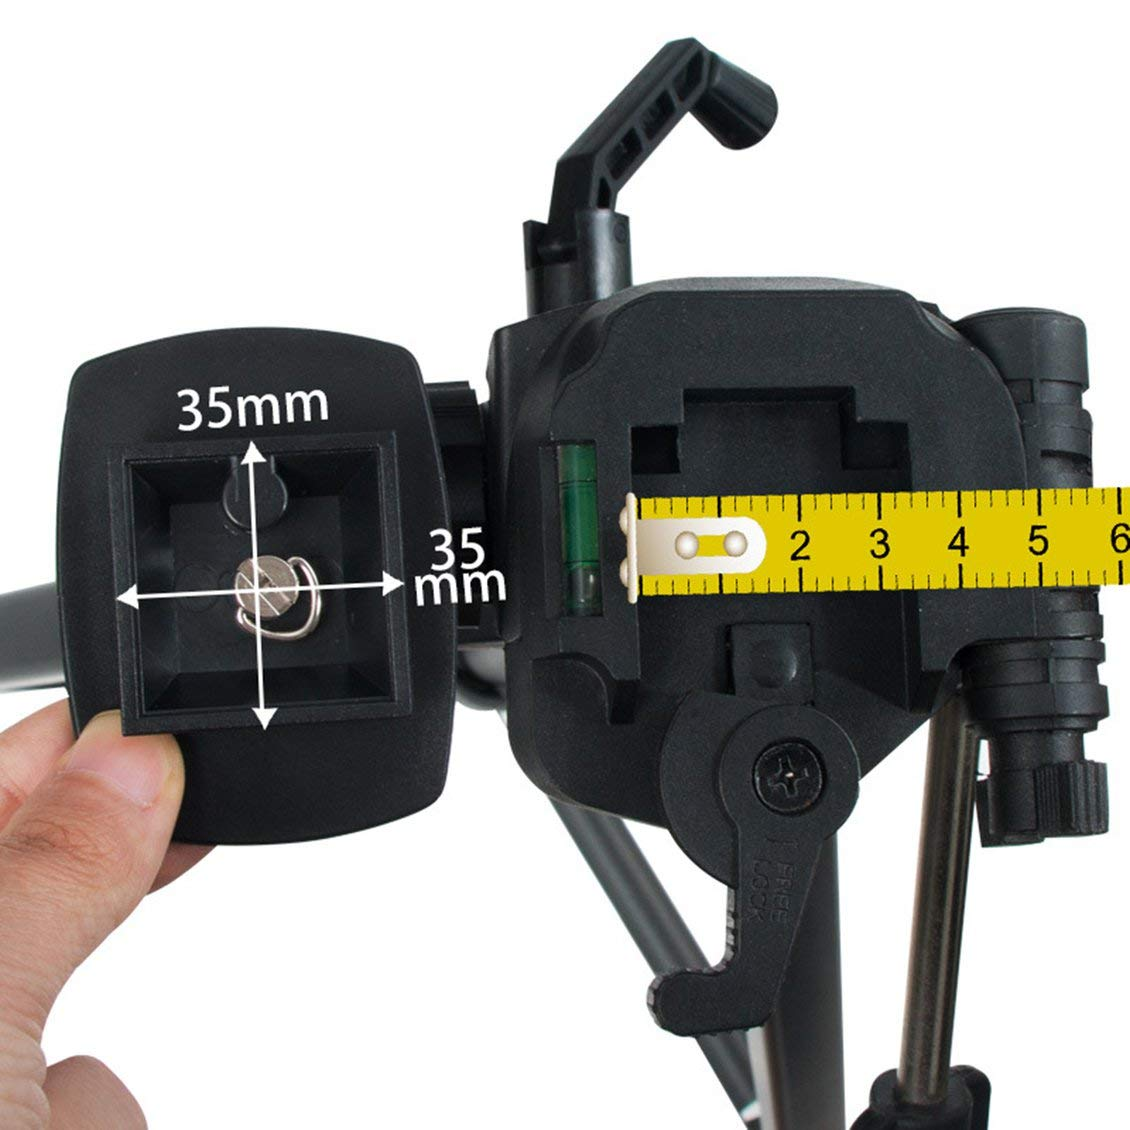 Tr/ípode Llave de montaje de c/ámara fija Accesorios de cabeza esf/érica de liberaci/ón r/ápida Mini adaptador de clip de abrazadera de placa negra-Negro